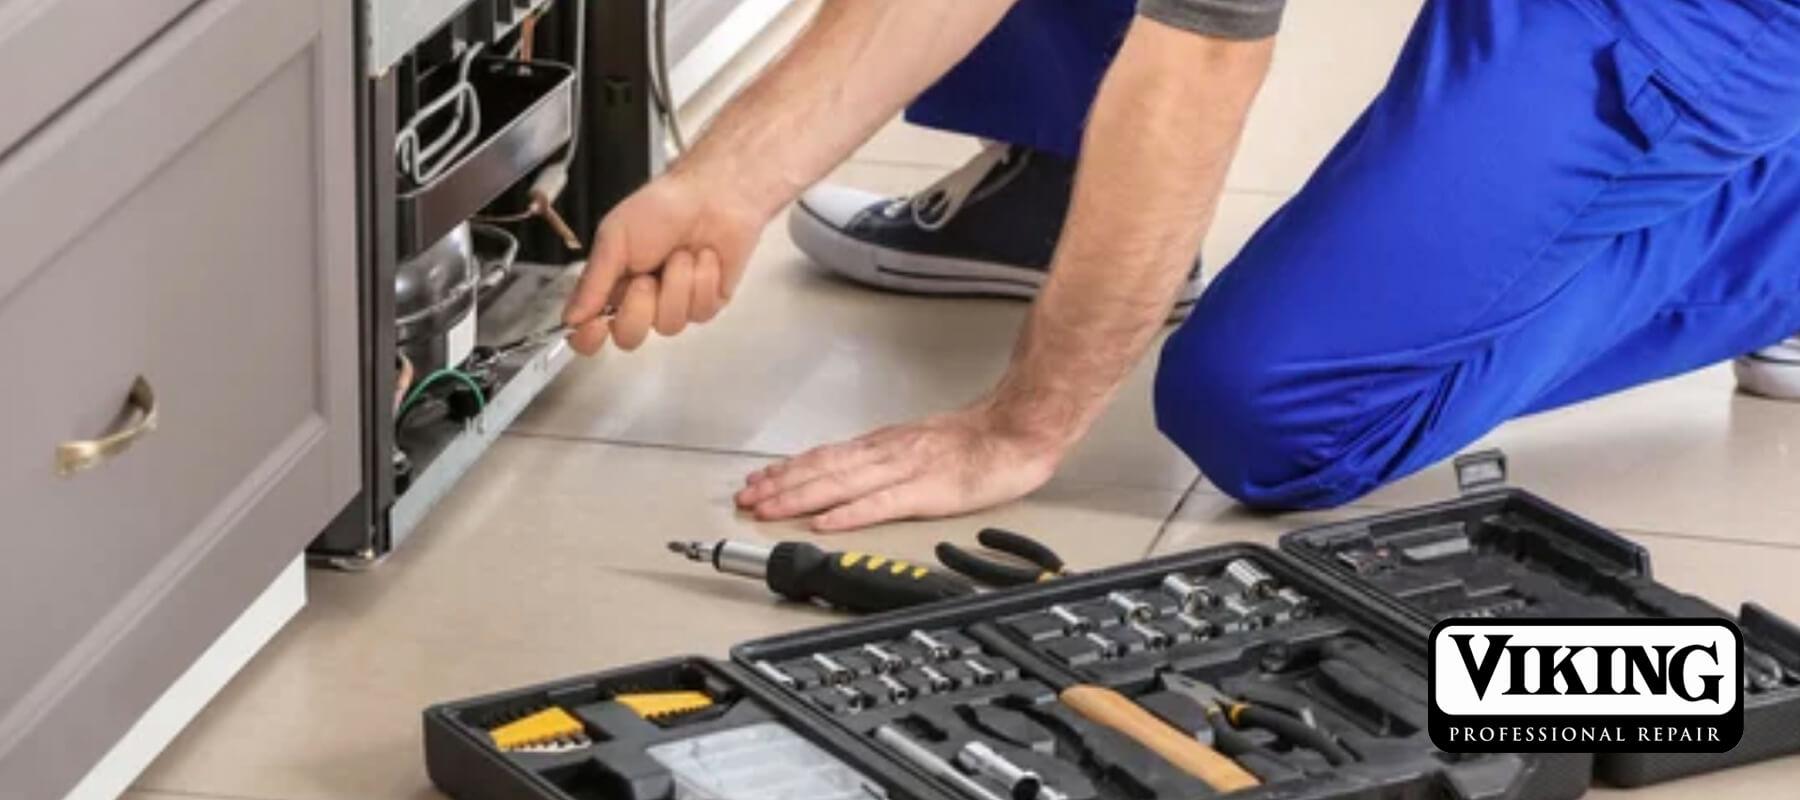 Authorized Viking Repair Thousand Oaks | Professional Viking Repair